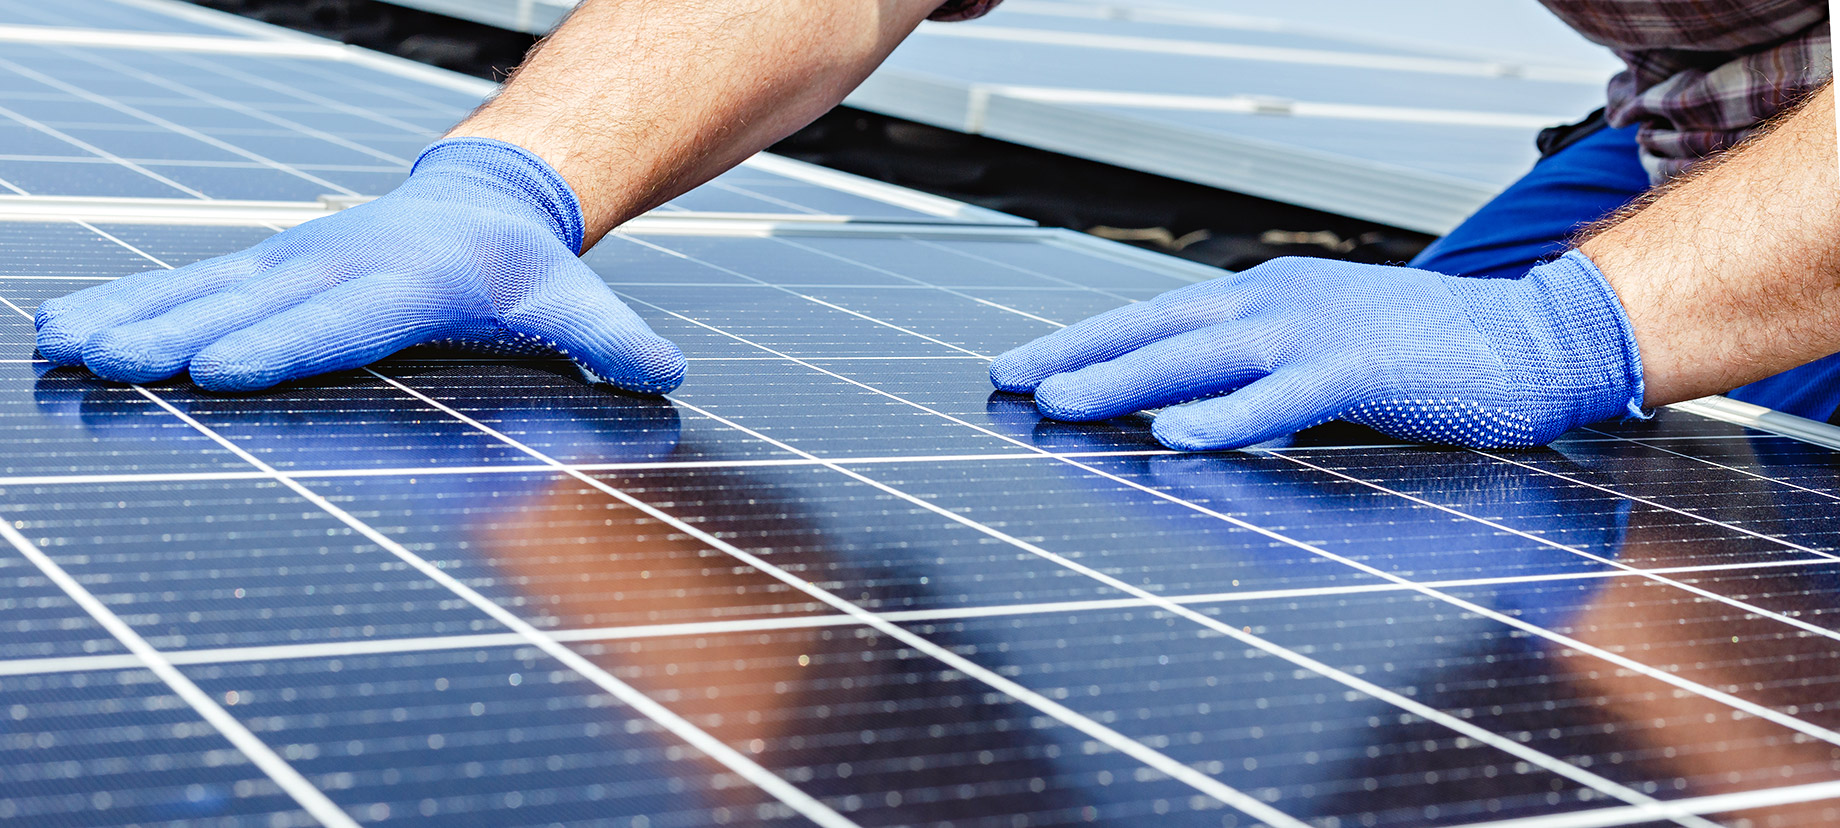 Installing Commercial Solar Panels